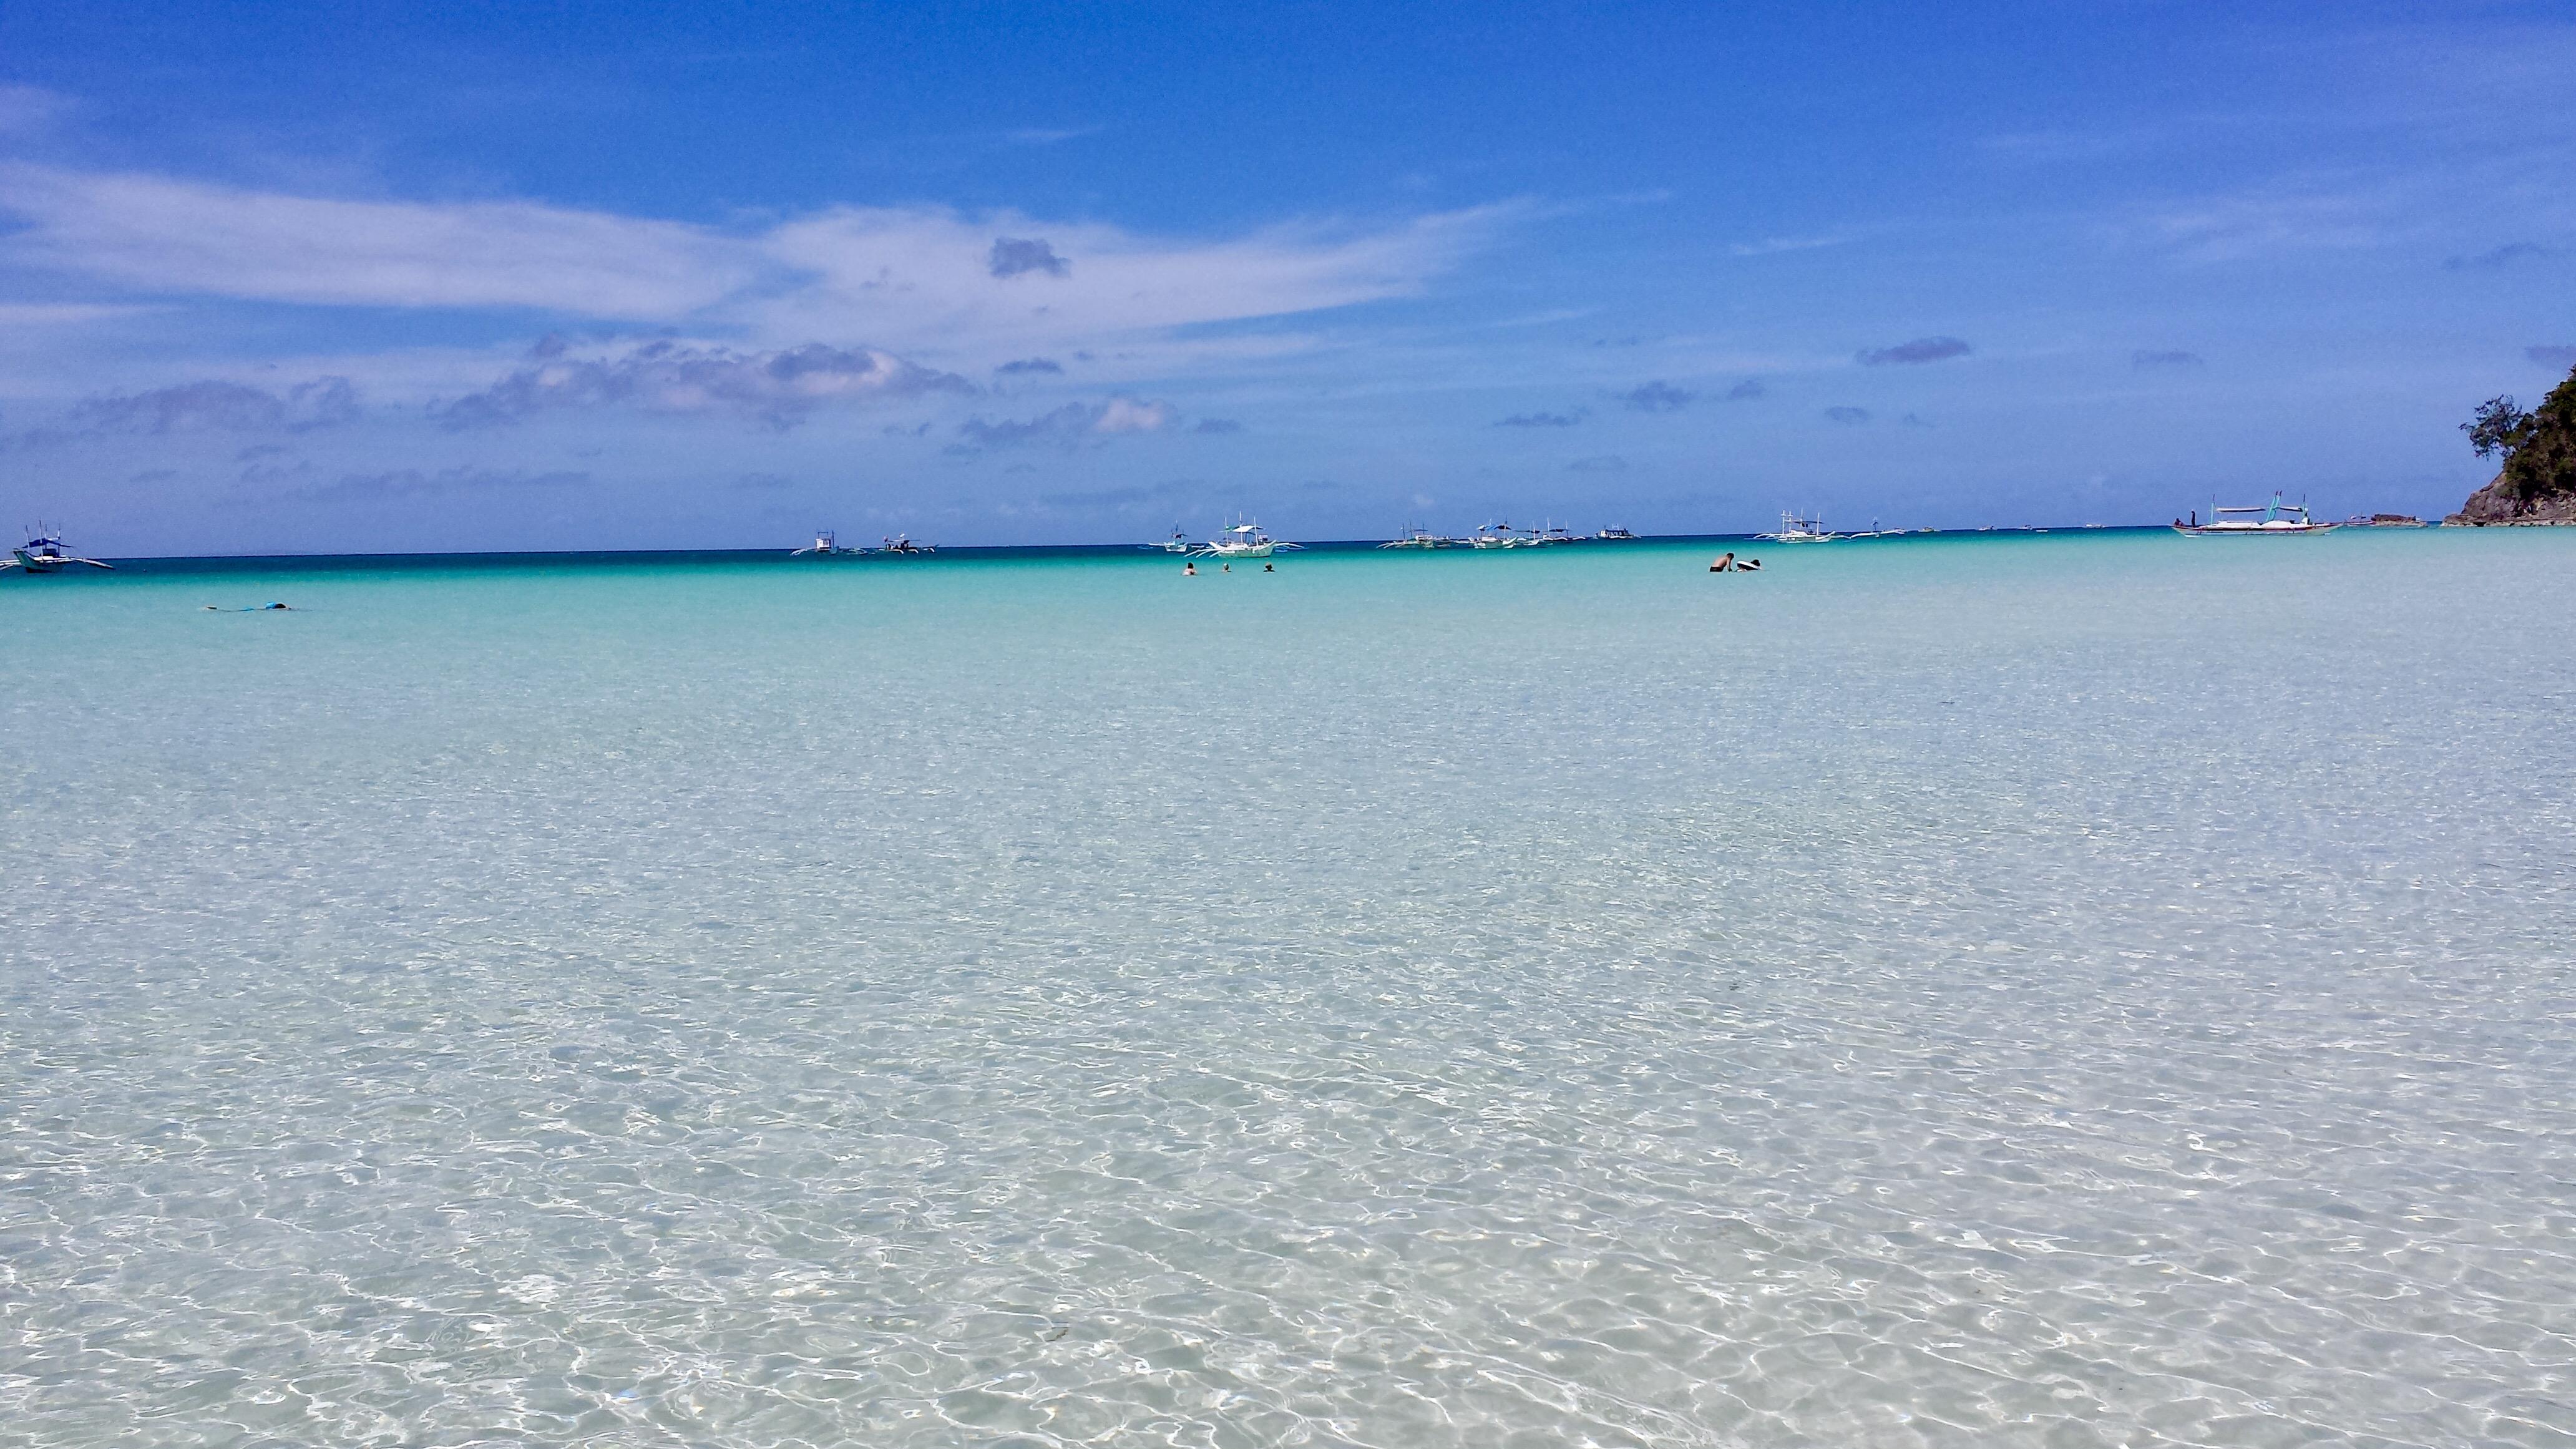 boracay_island_philippines_lustforthesublime